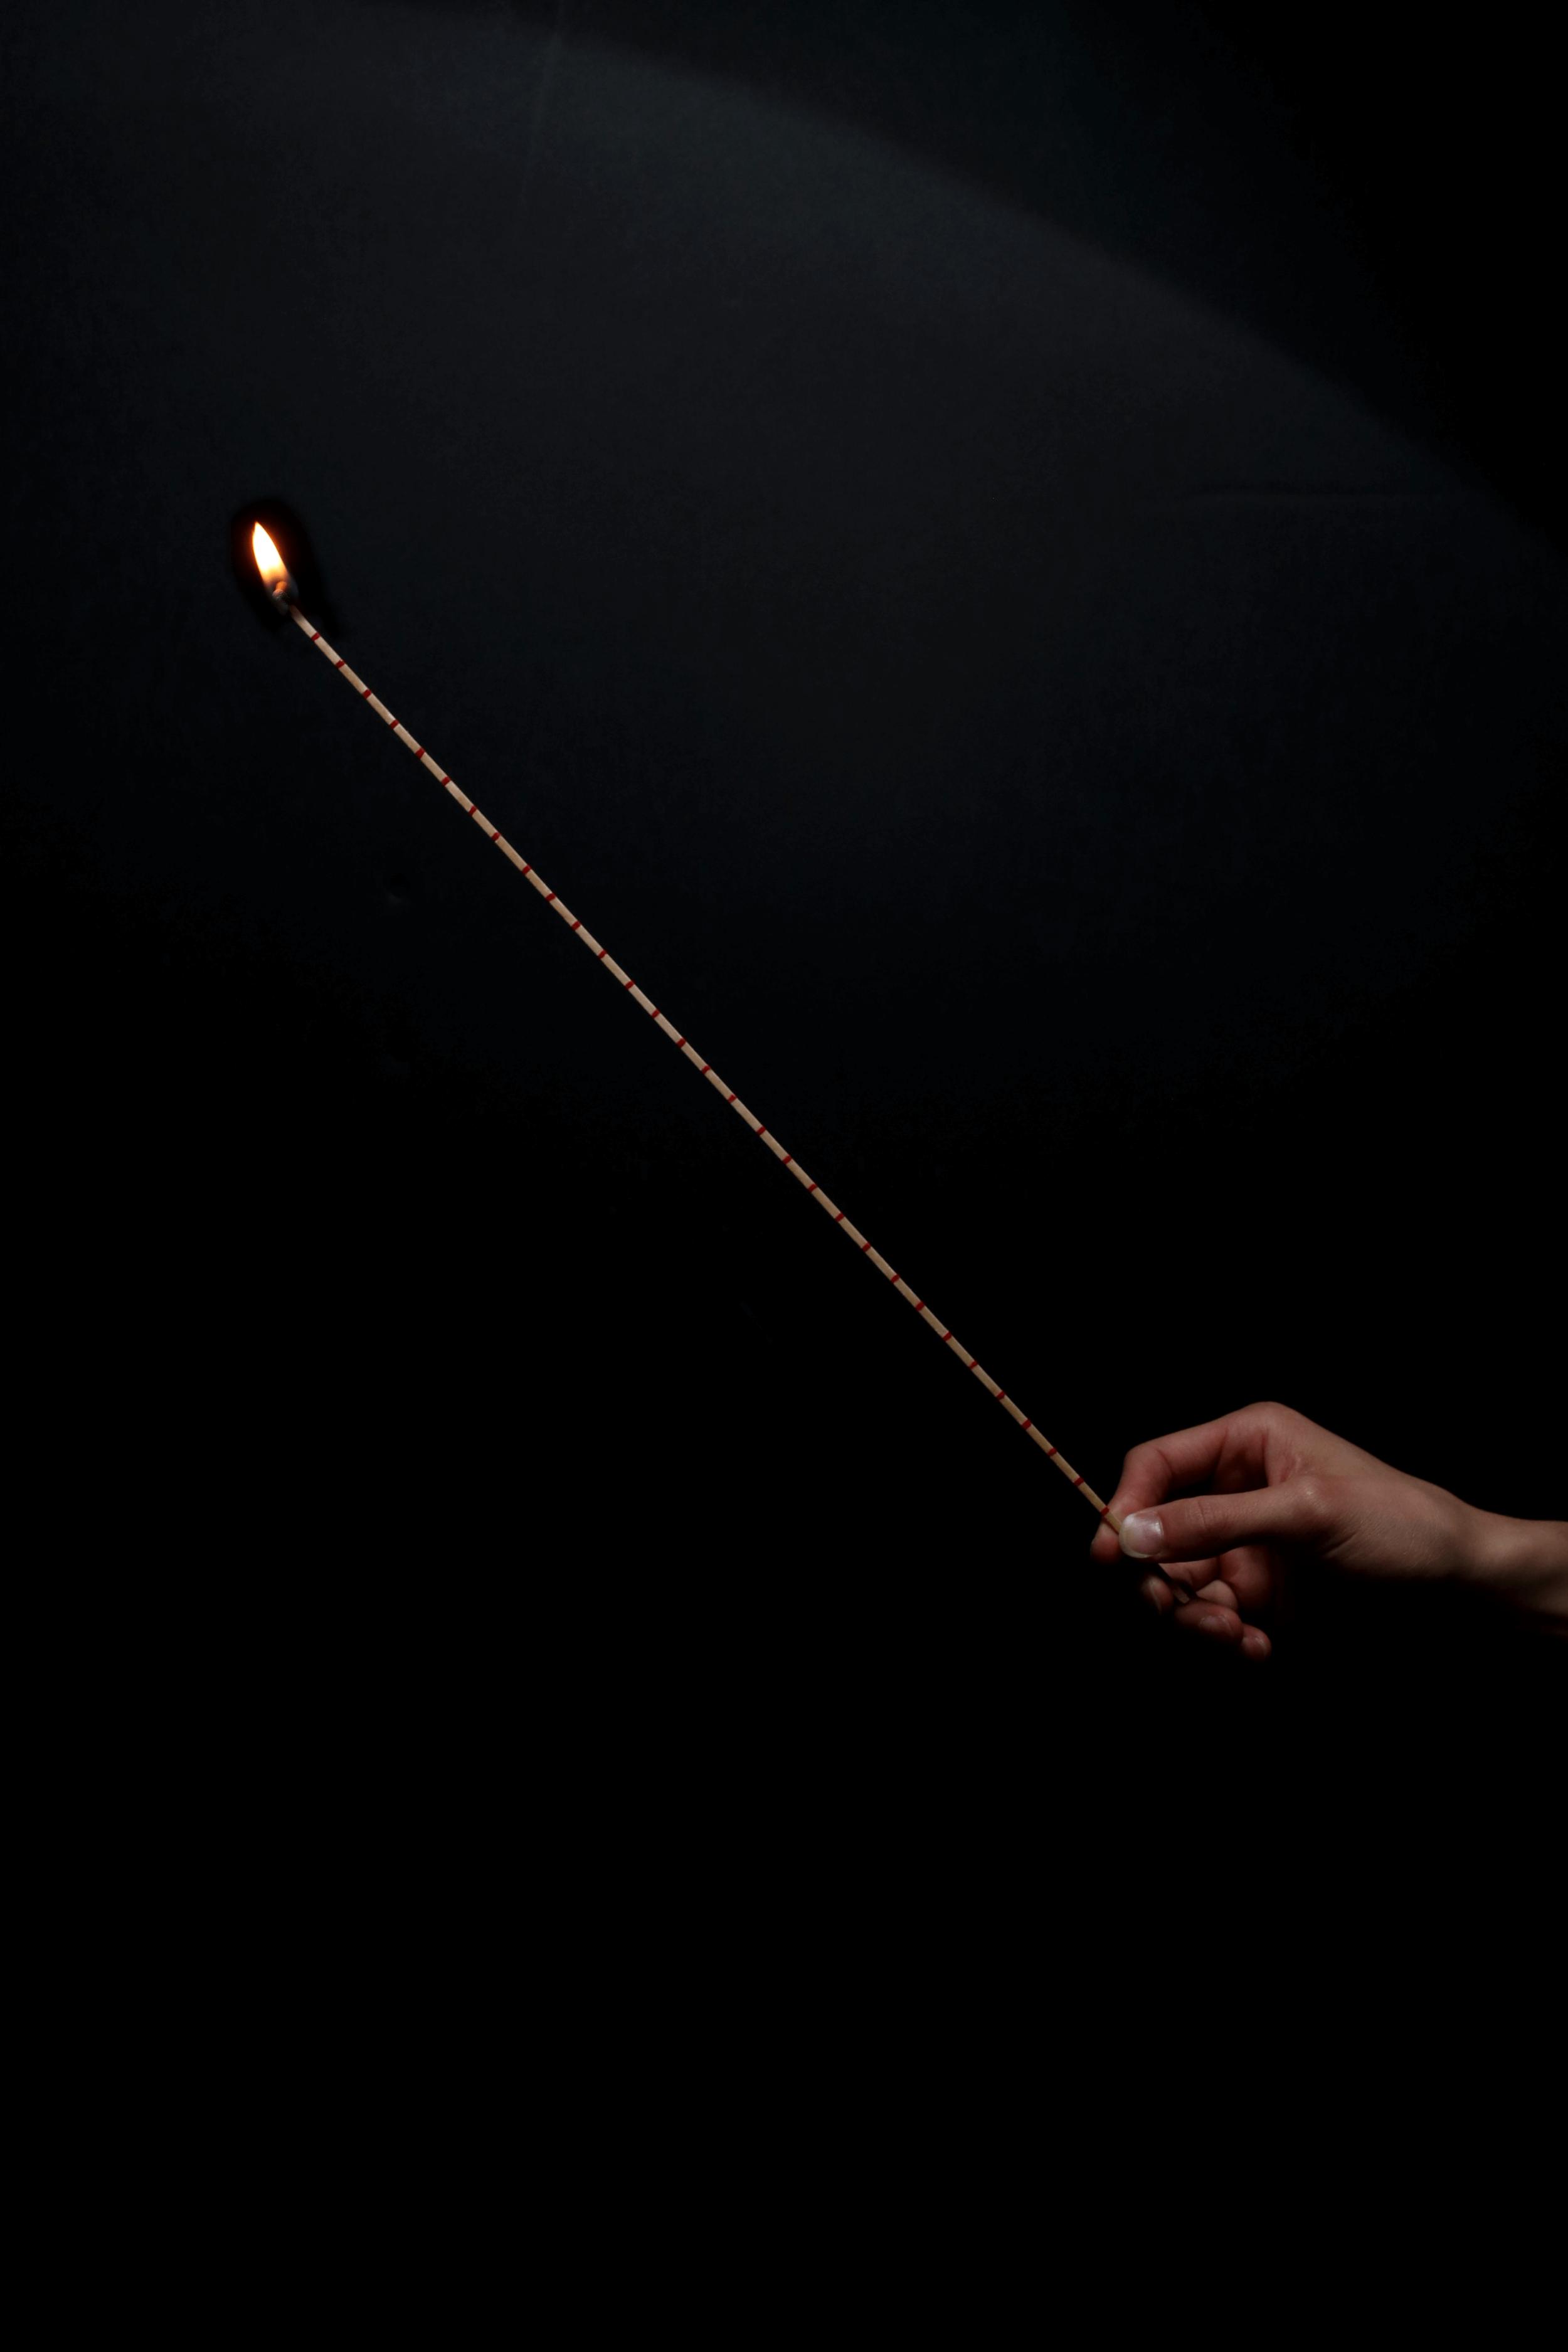 2-min-match-fire-1 small.png